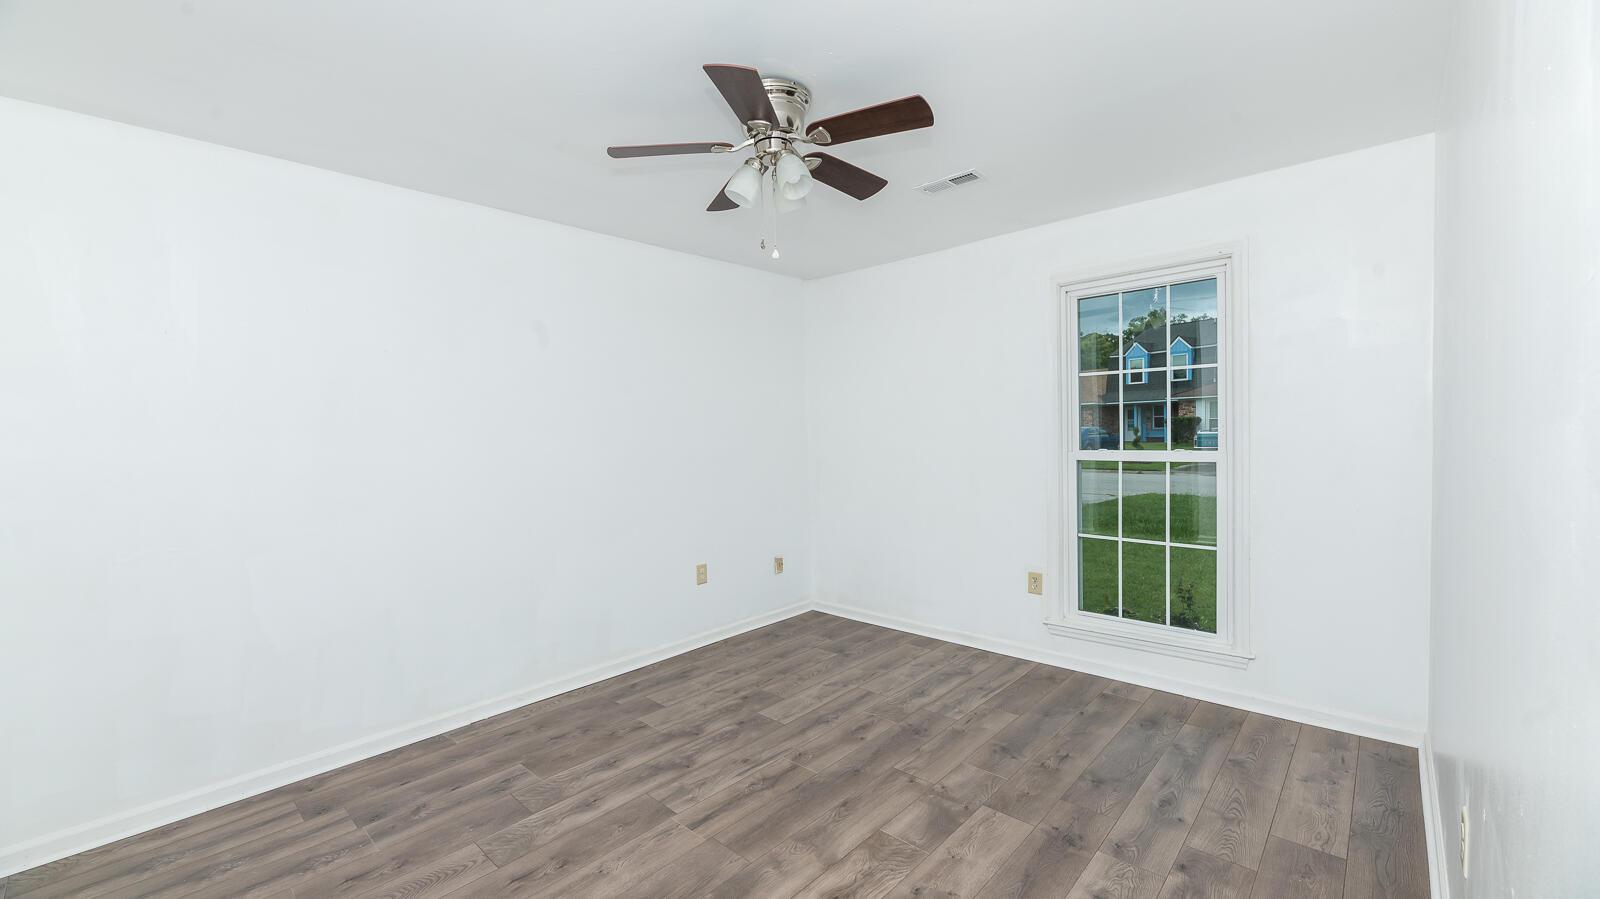 Ashley Villas Homes For Sale - 4315 Briarstone, North Charleston, SC - 1